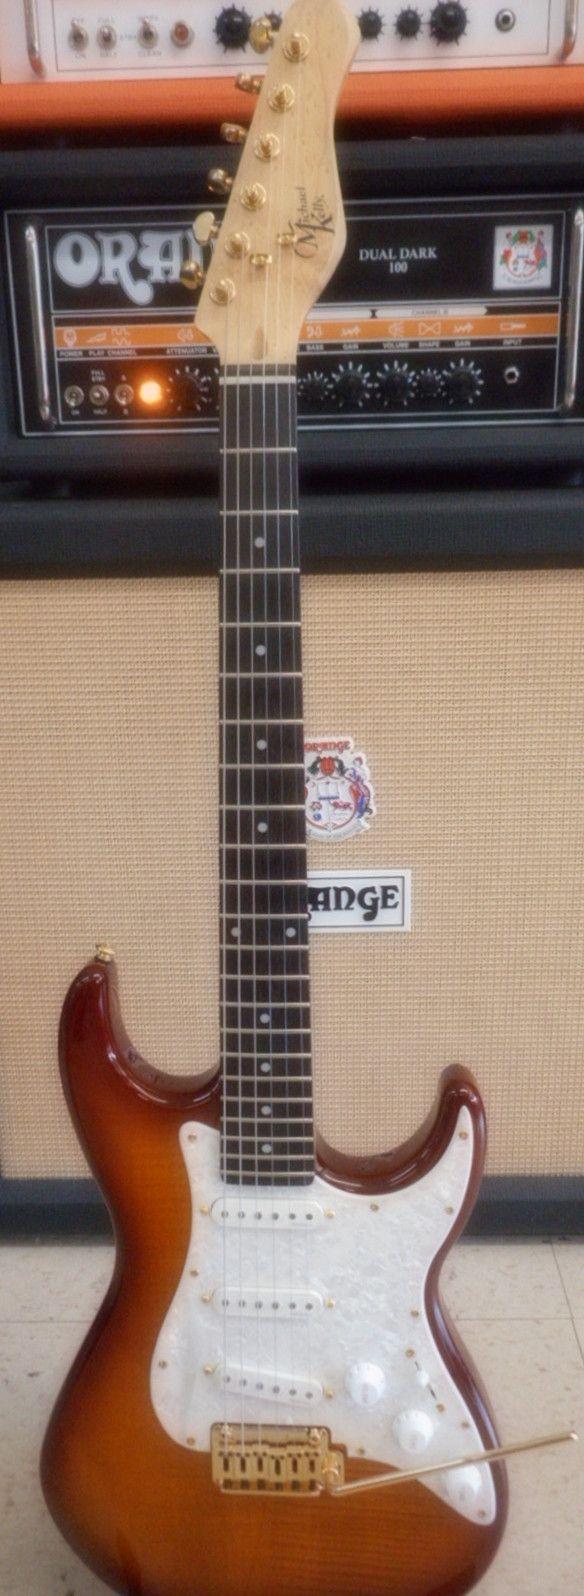 Demo Michael Kelly 1960 Evolution Electric Guitar